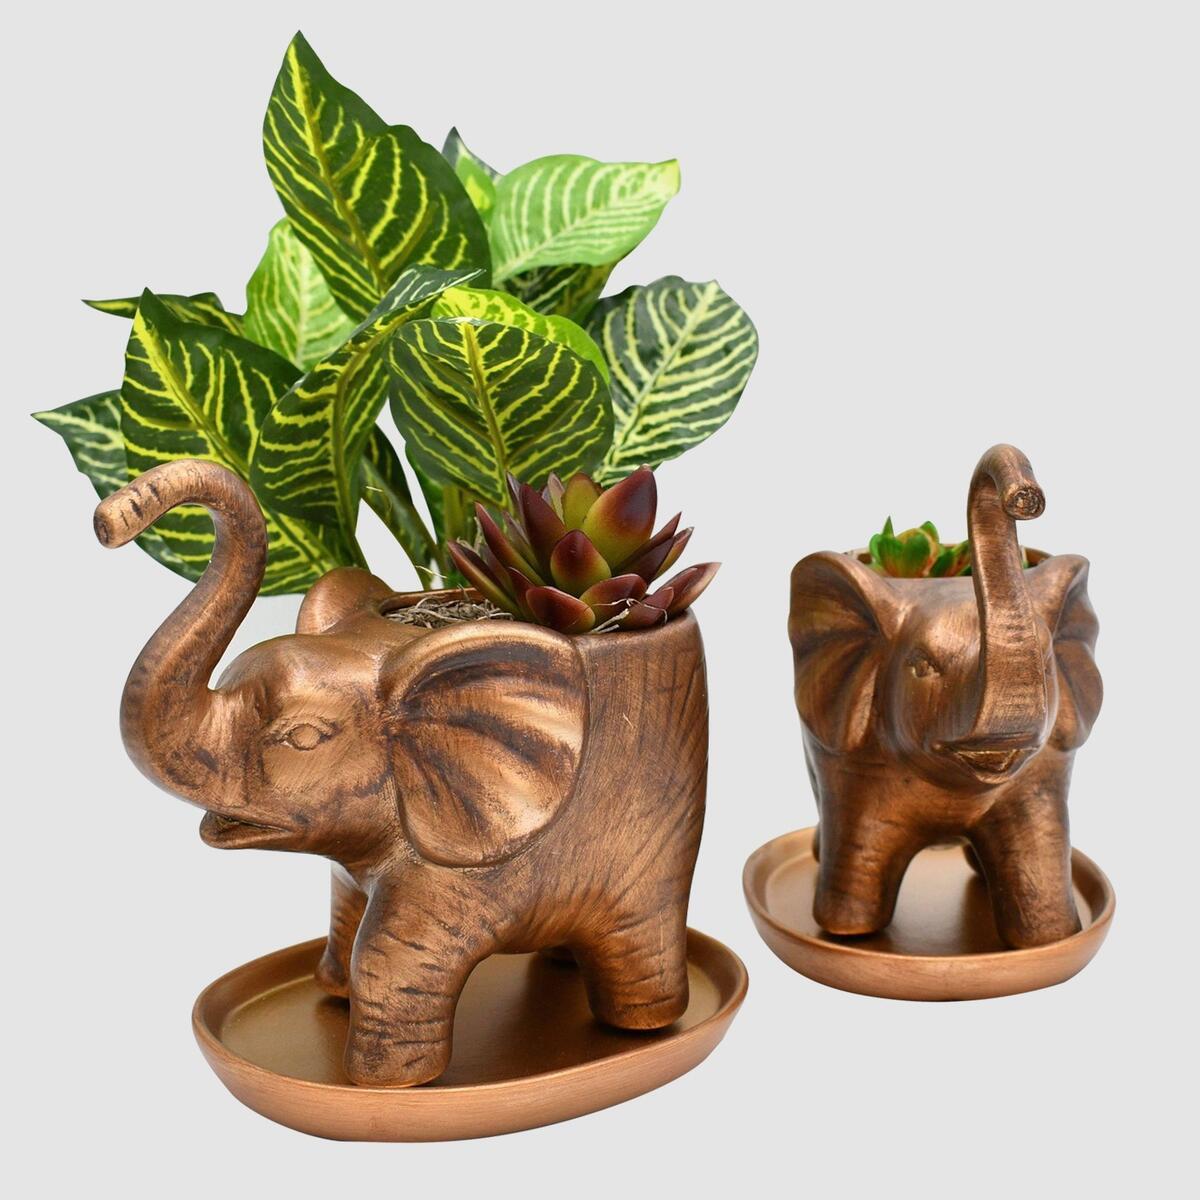 Elephant Planter Set - Good Luck, Heart Shaped Trunks